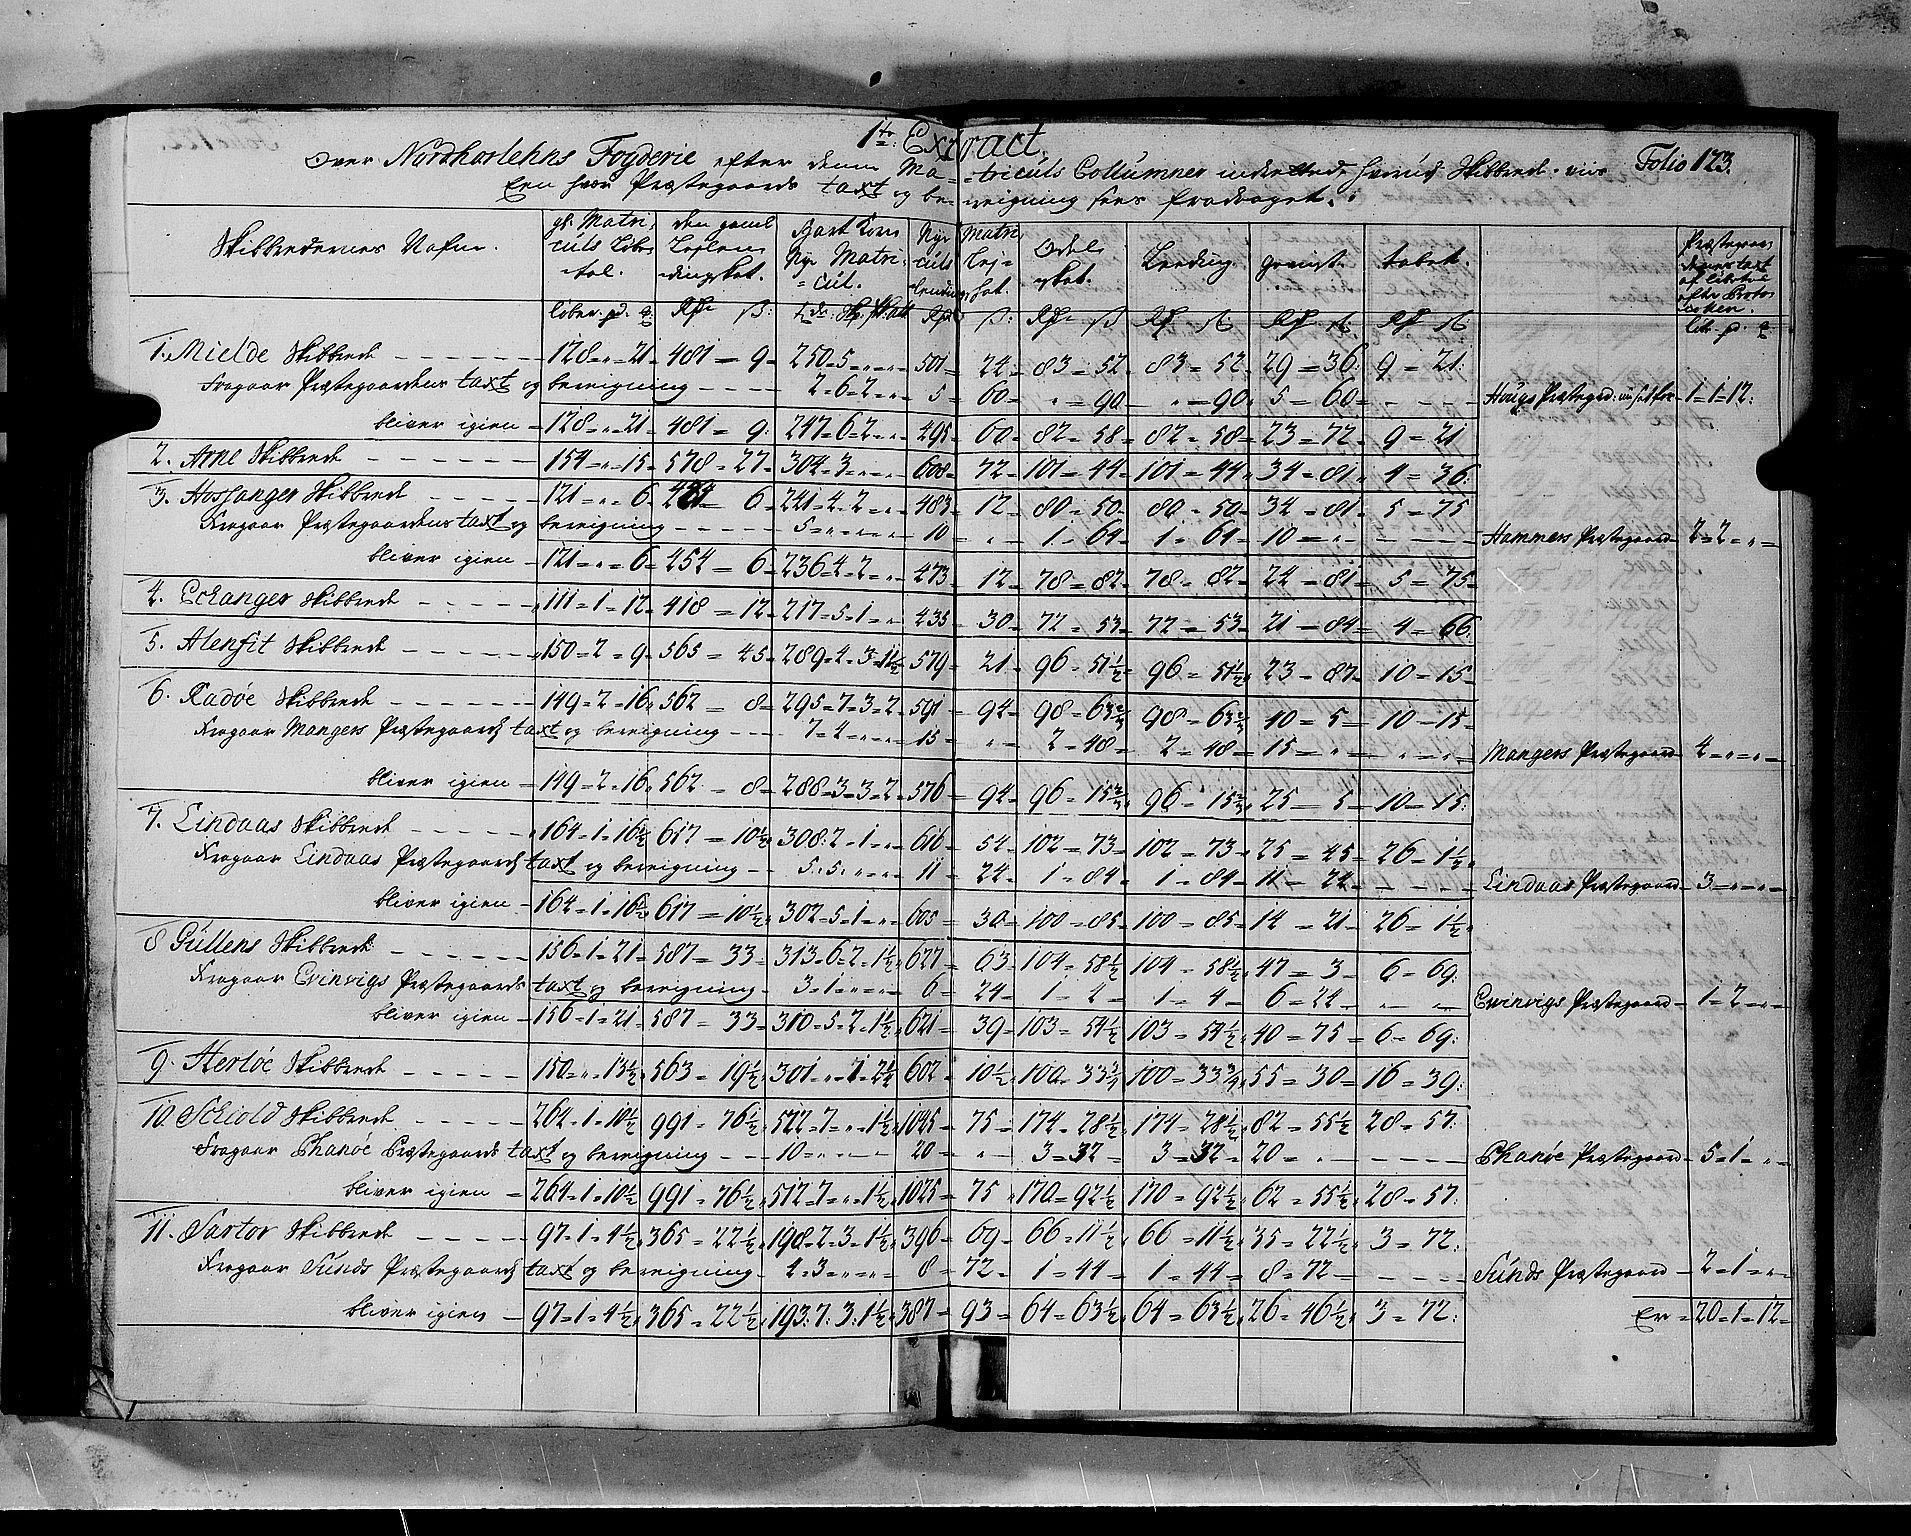 RA, Rentekammeret inntil 1814, Realistisk ordnet avdeling, N/Nb/Nbf/L0140: Nordhordland matrikkelprotokoll, 1723, s. 122b-123a